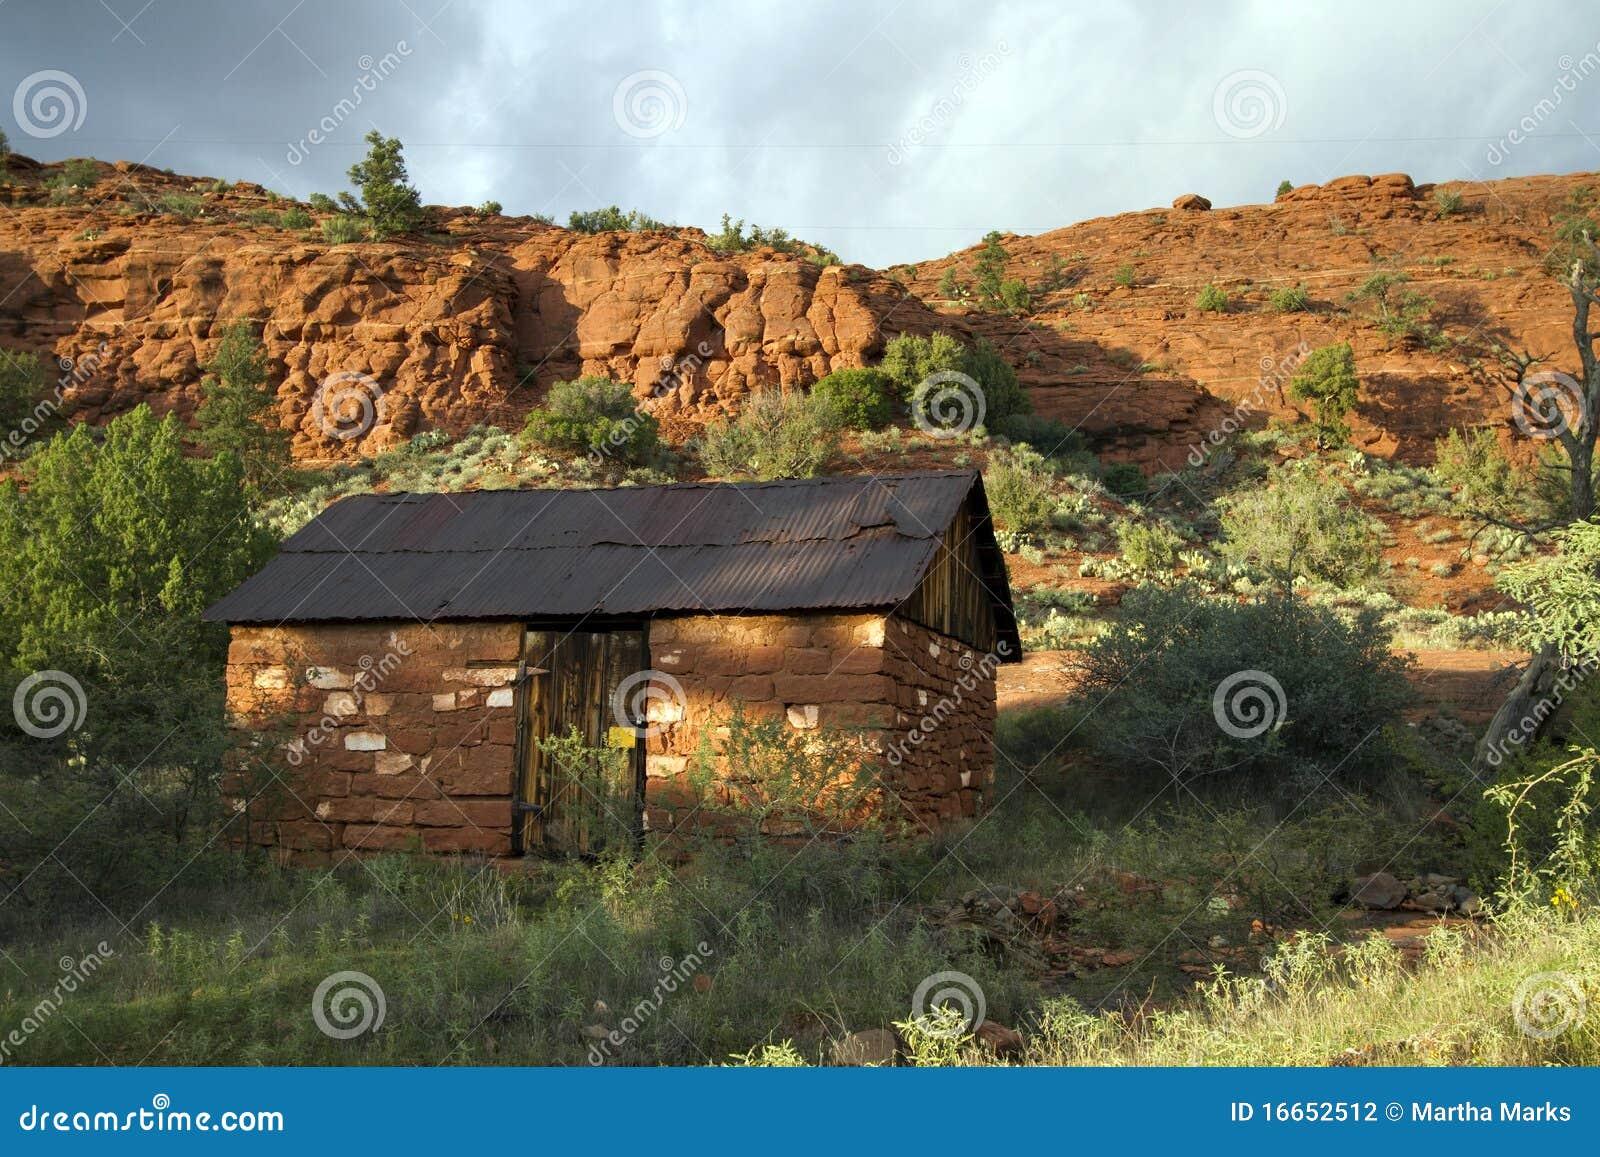 Old adobe cabin sedona arizona stock photography image for Cabin in sedona az